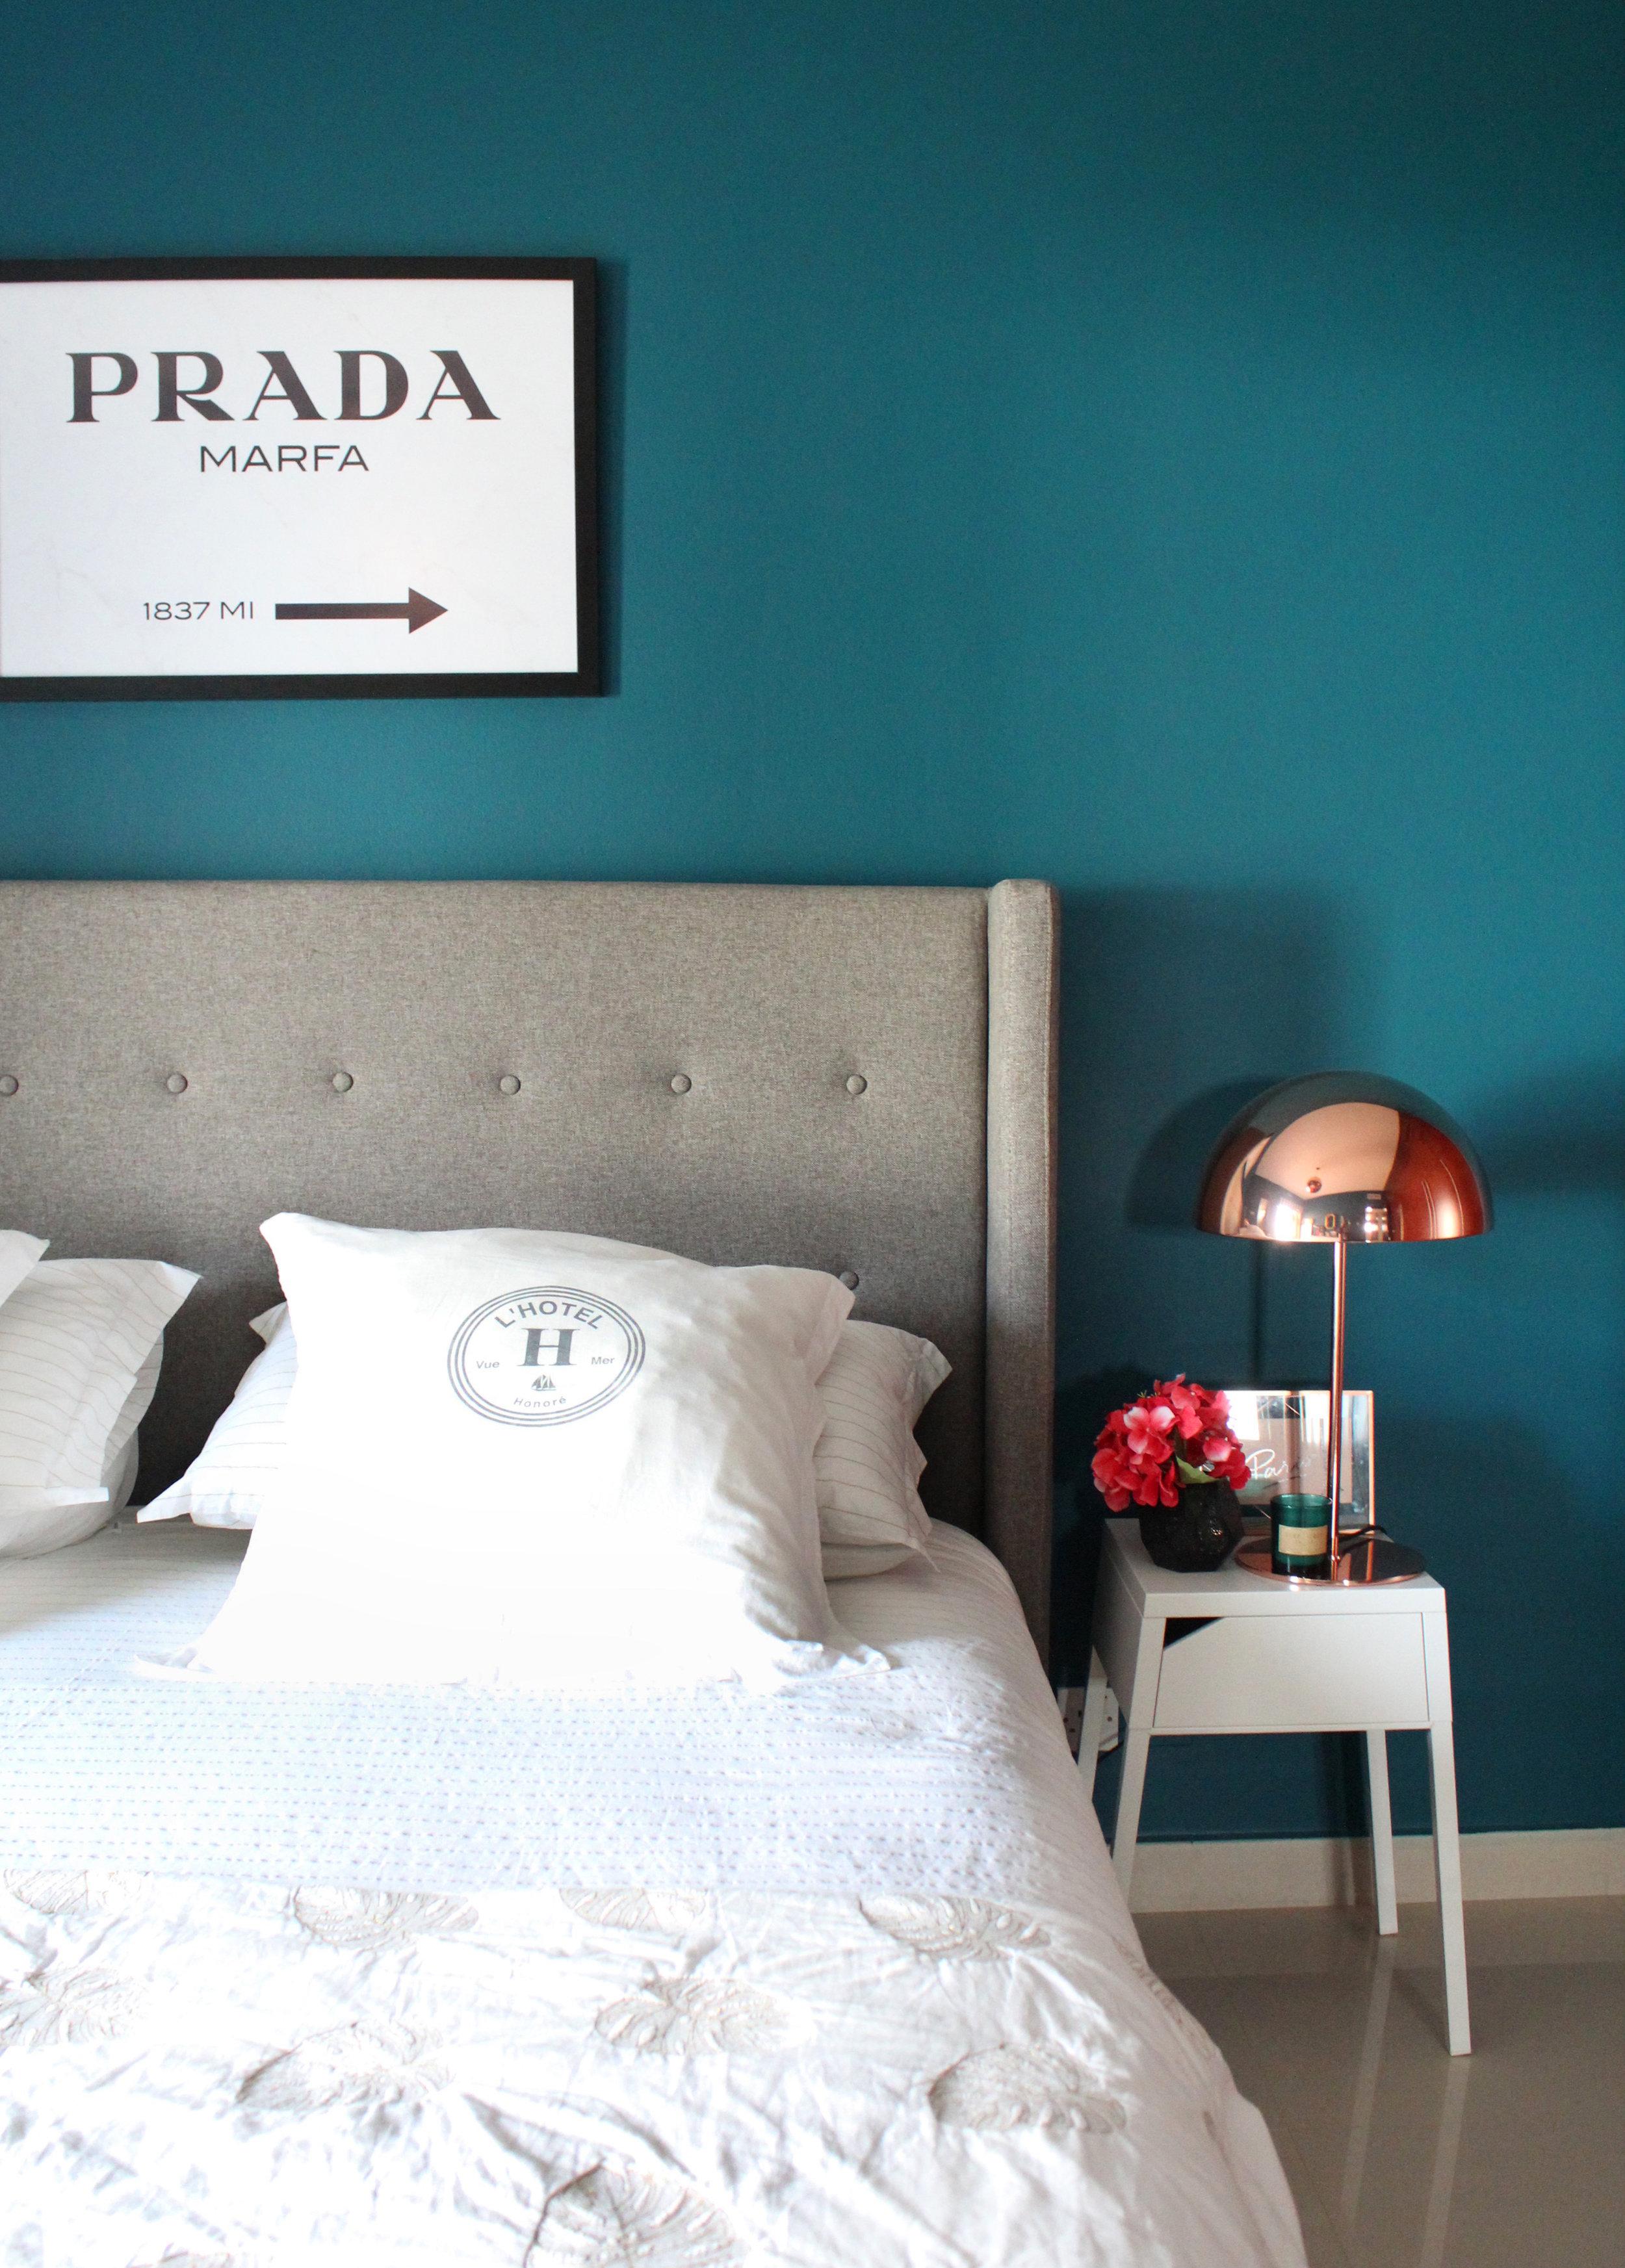 emilies bedroom - 17 of 60.jpg